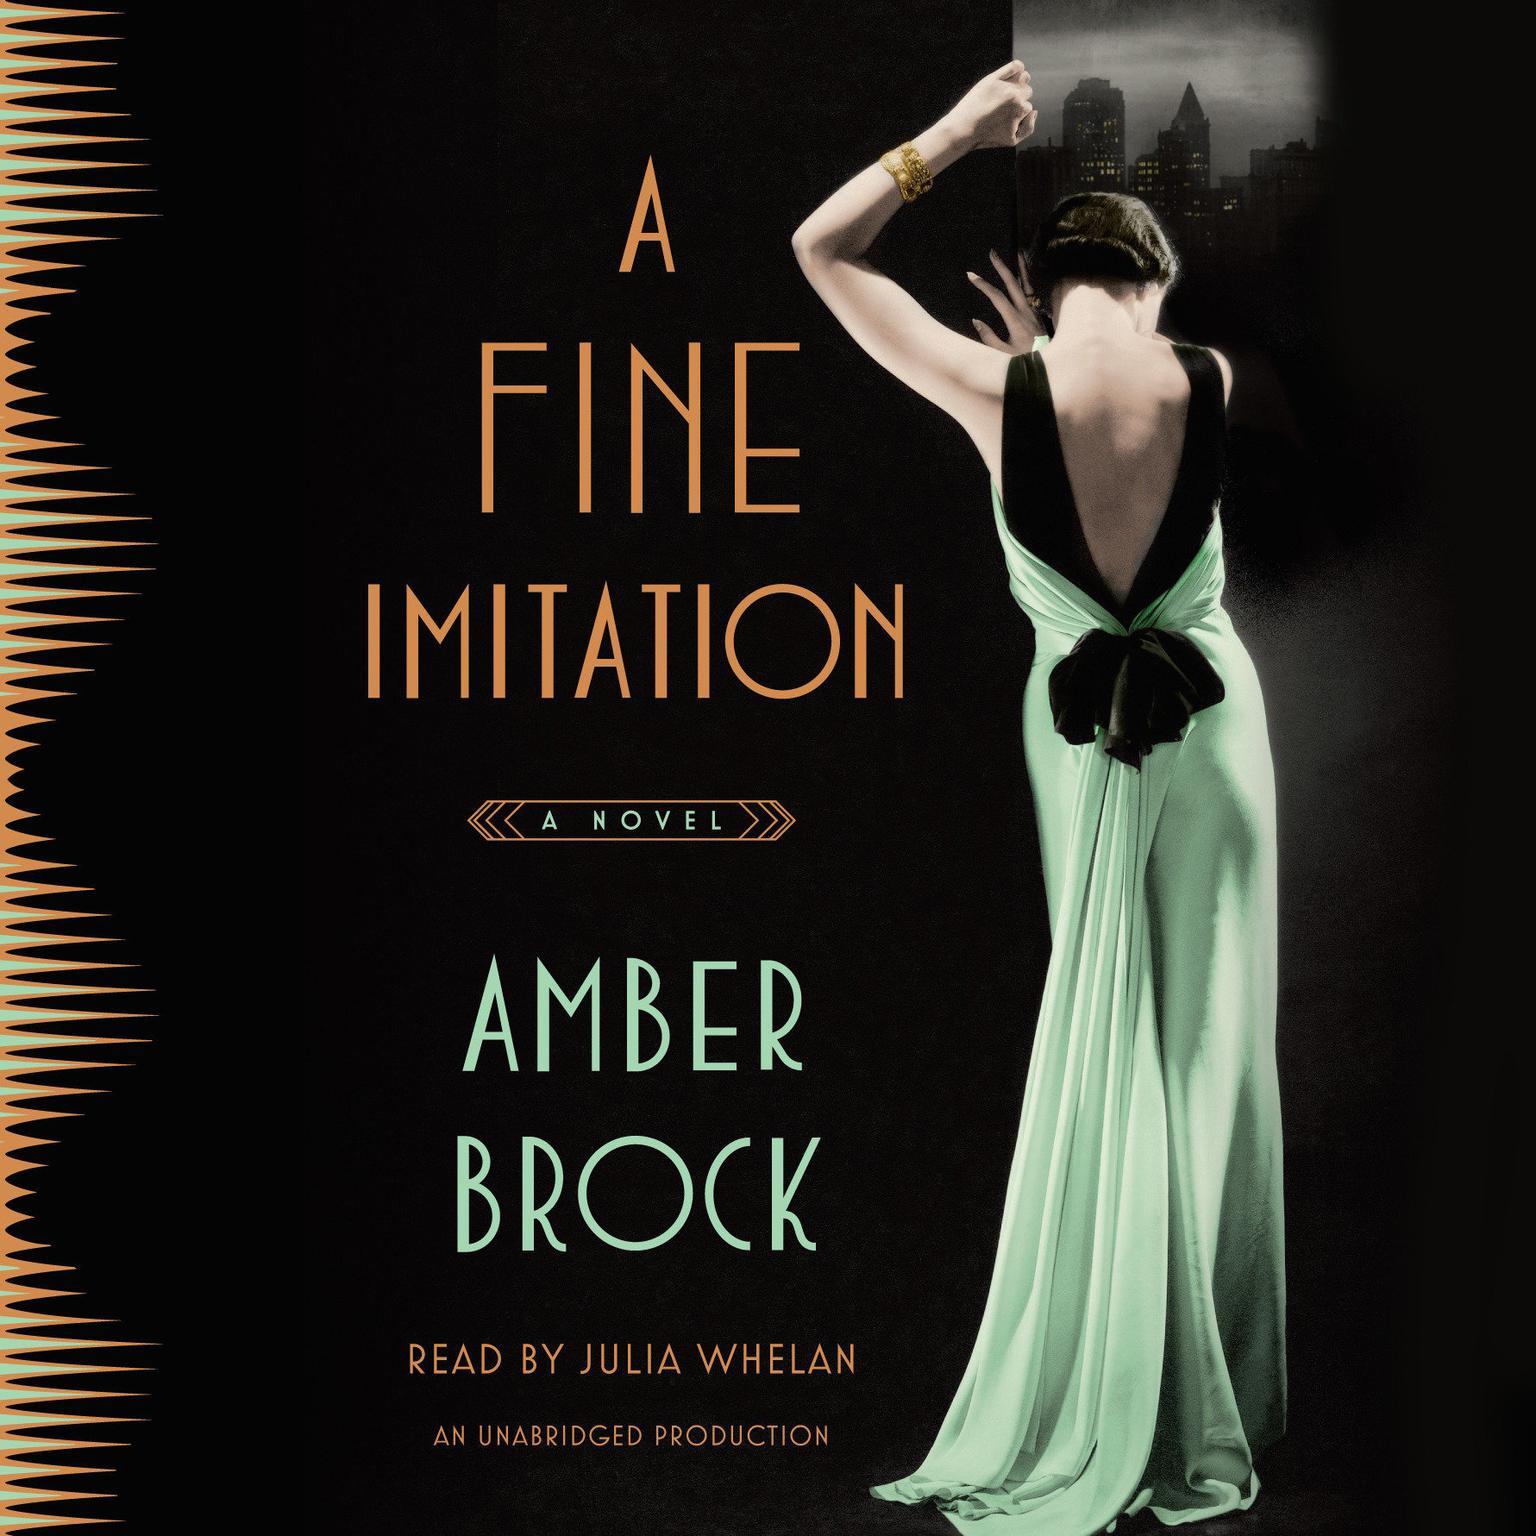 Printable A Fine Imitation: A Novel Audiobook Cover Art